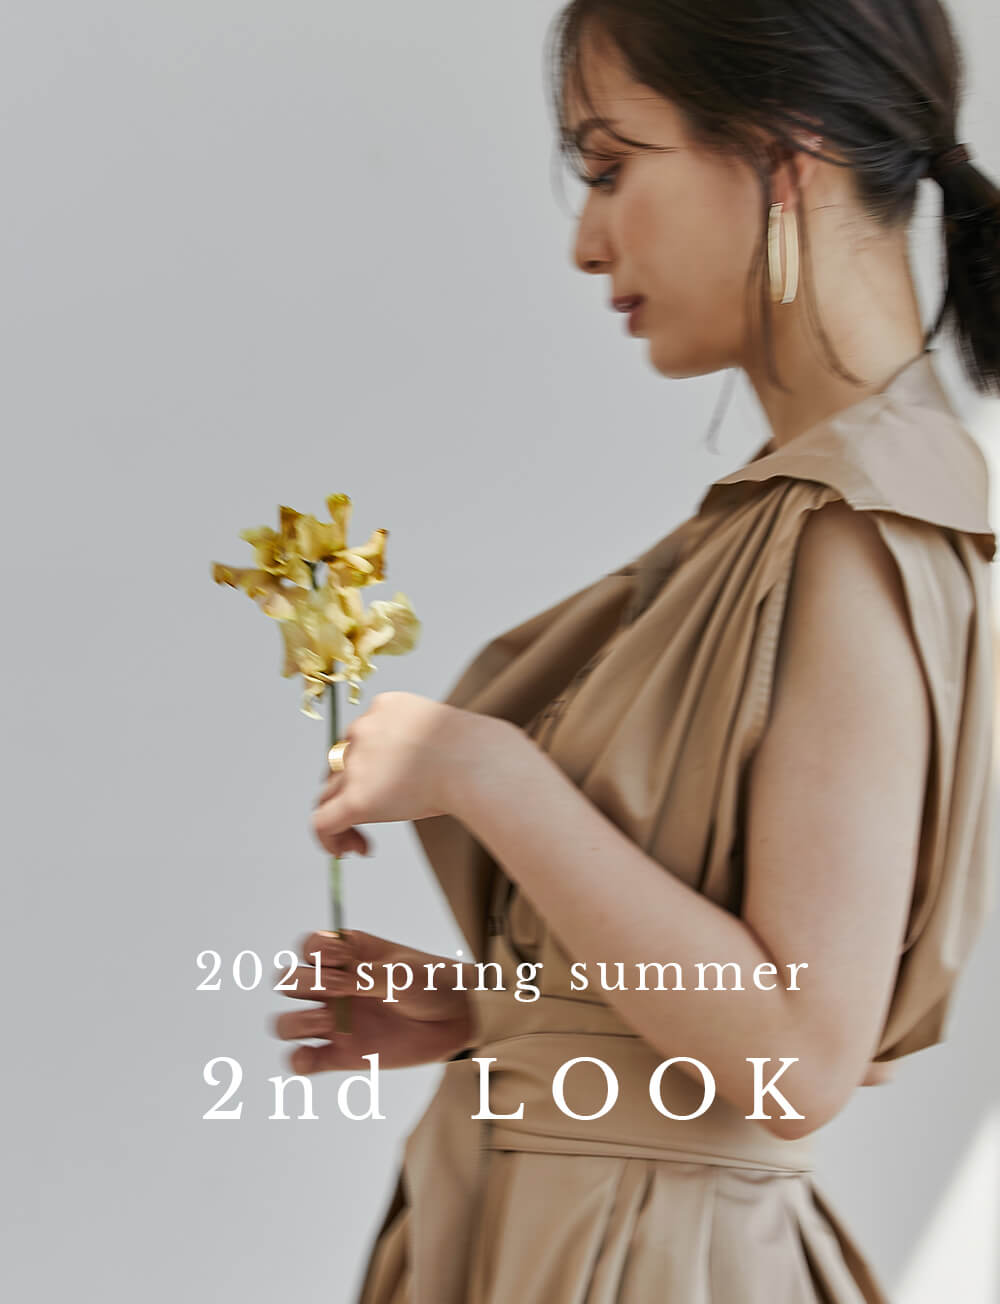 2021 spring summer 2nd LOOK